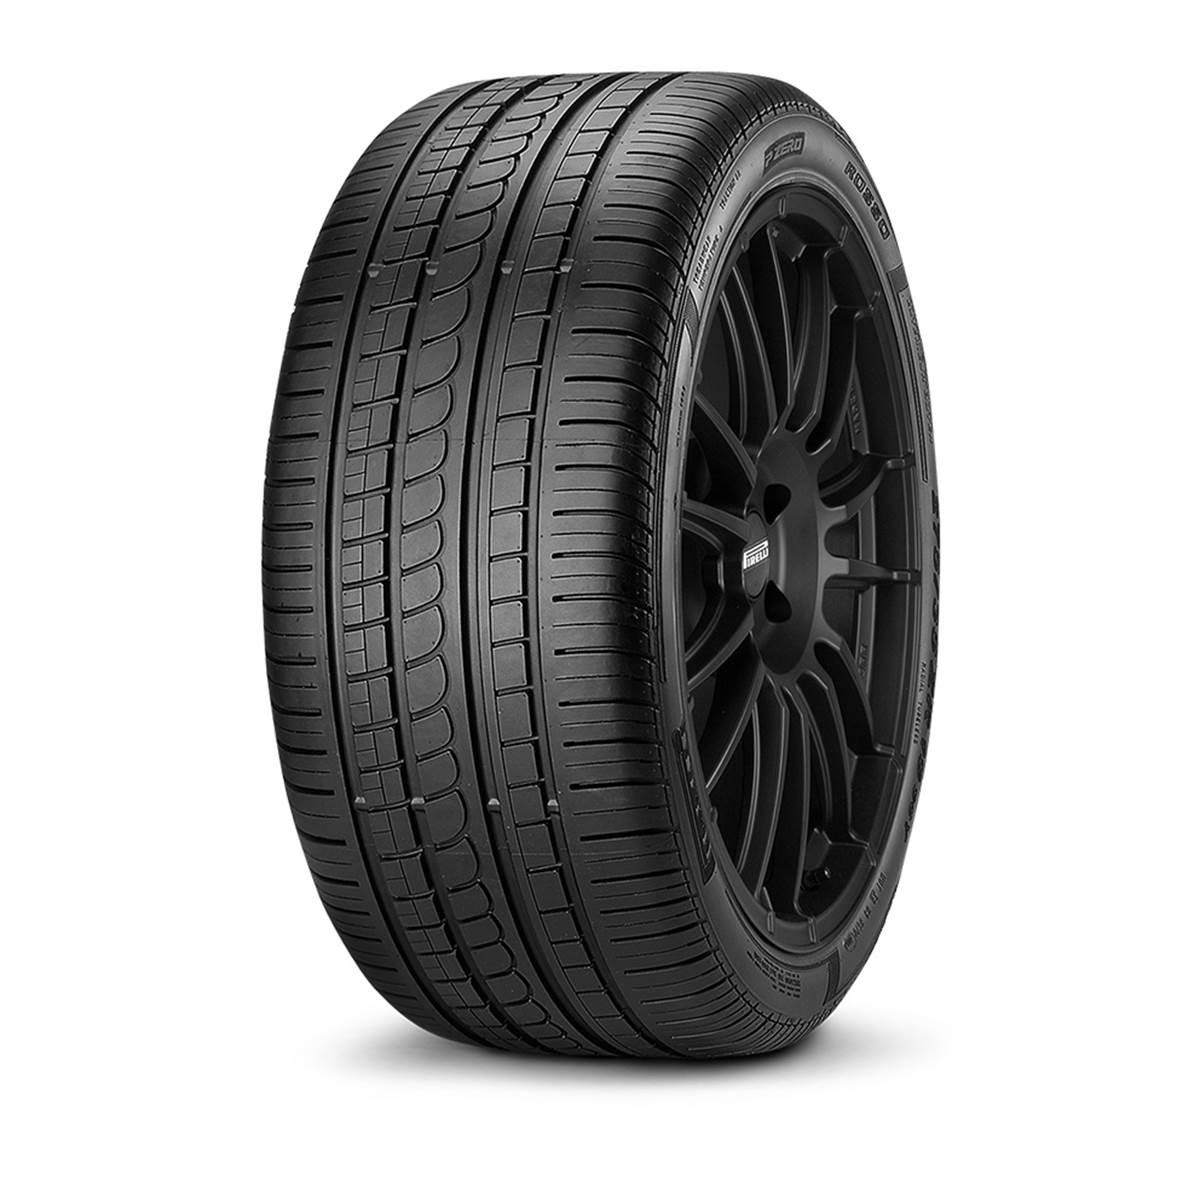 Pirelli P Zero Rosso Asimmetrico pneu